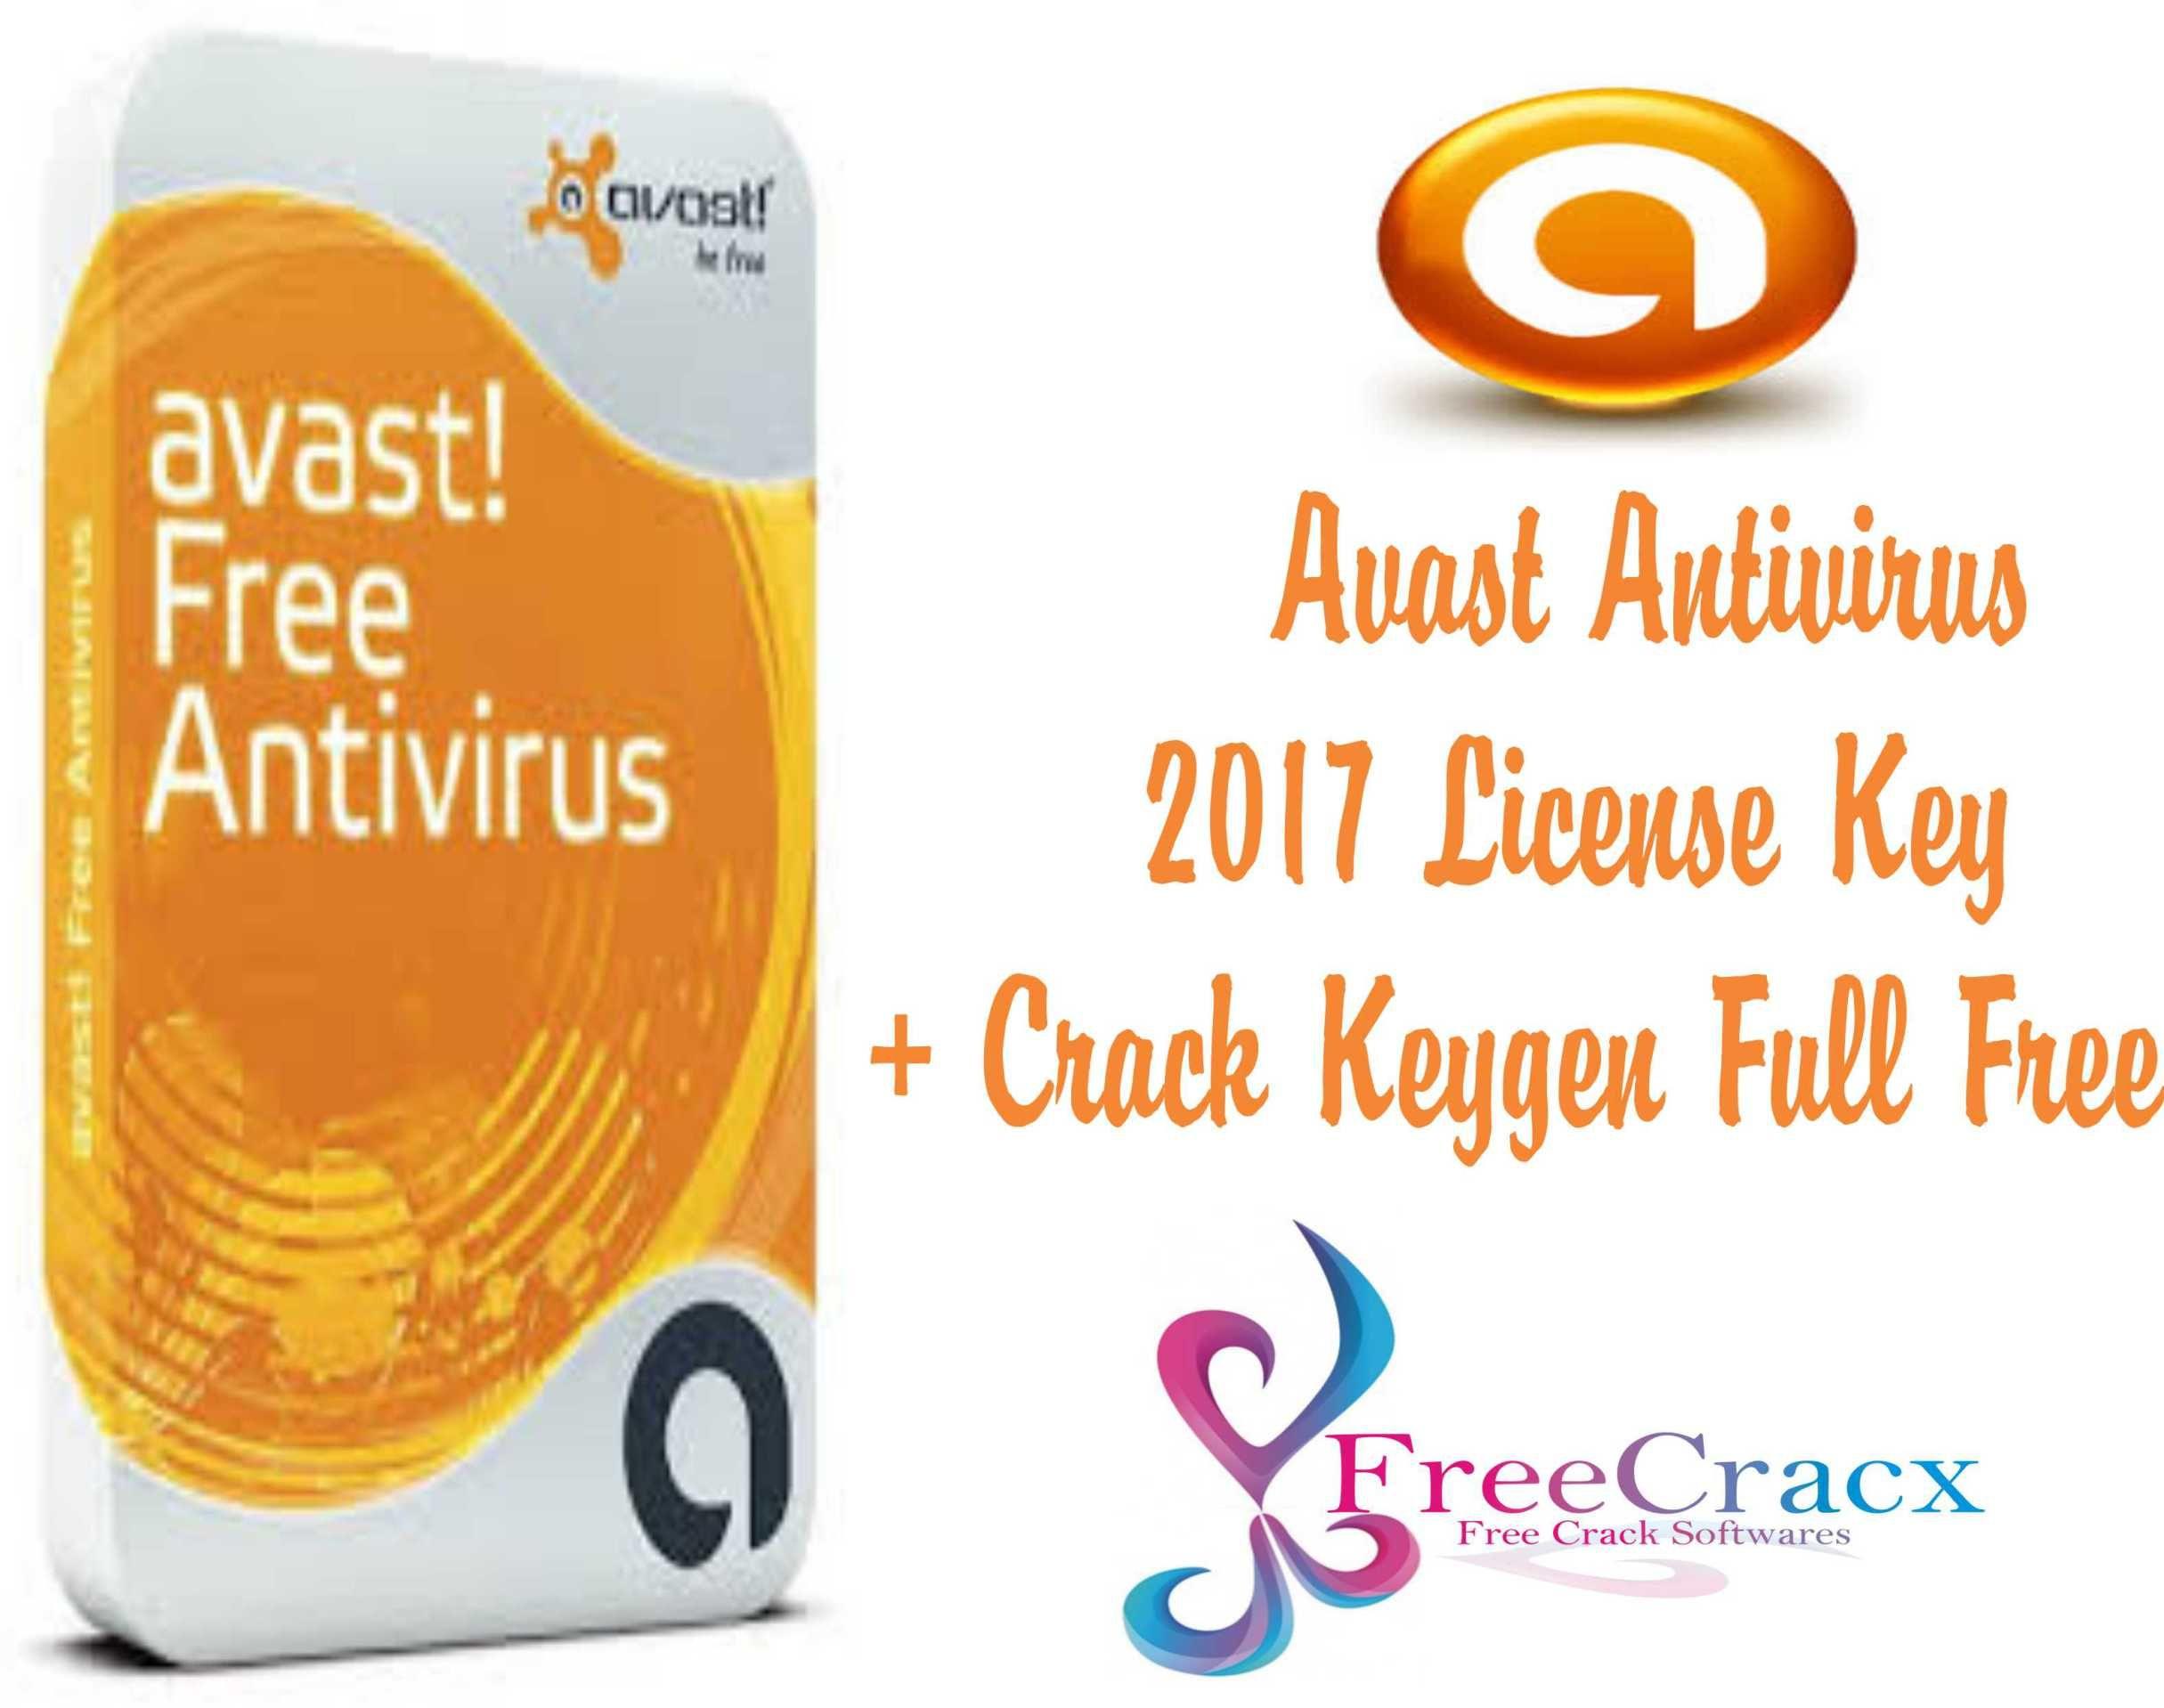 avast free antivirus 2017 product key